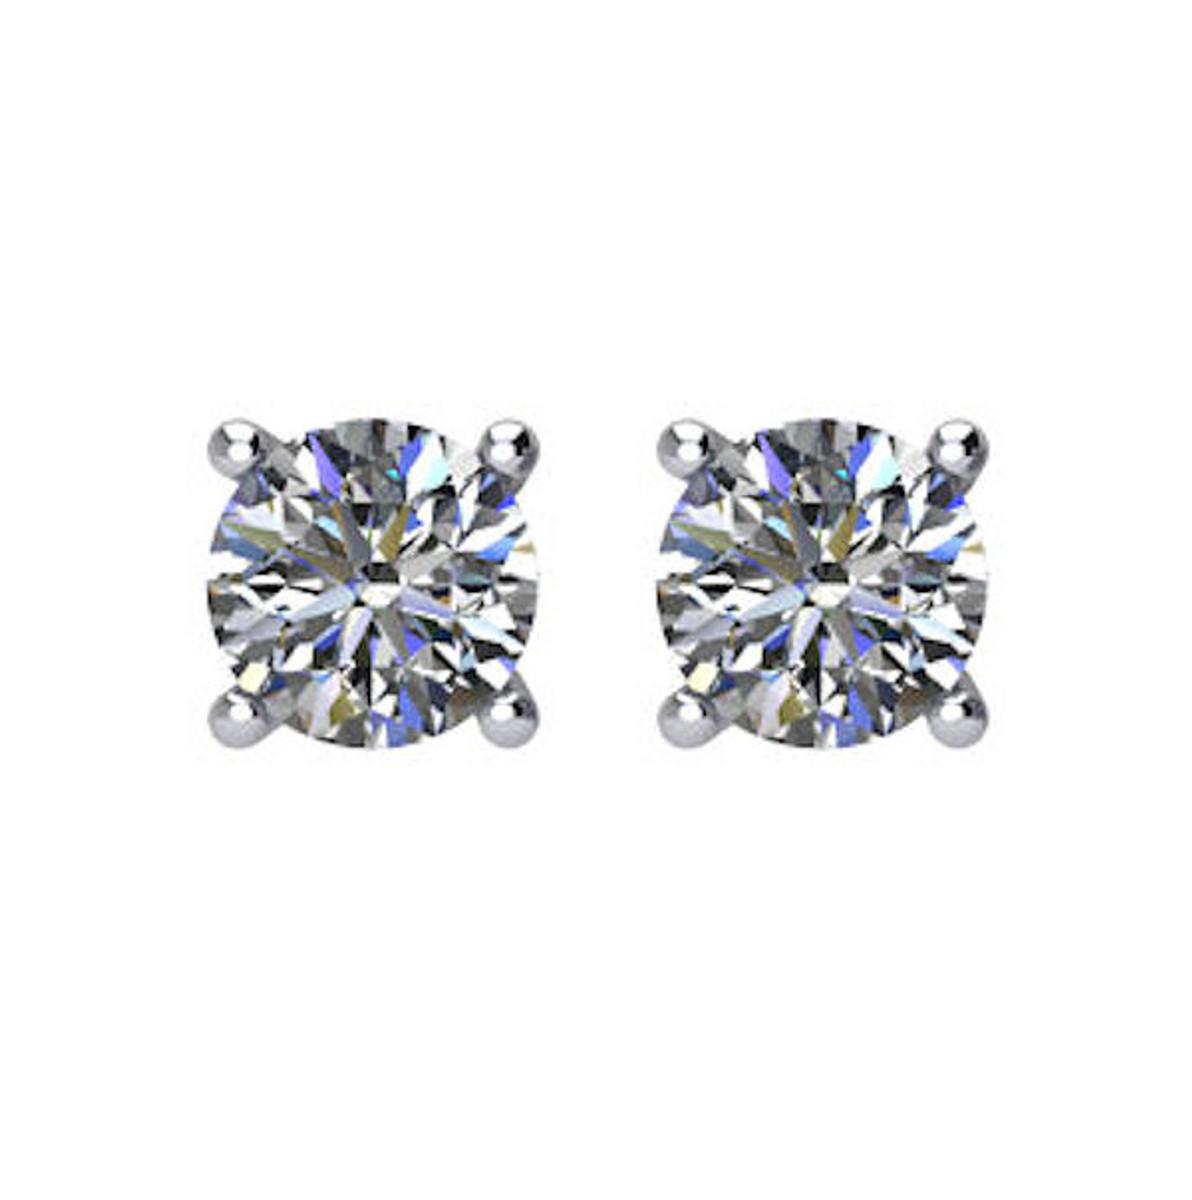 1/4 CT TW Round Diamond Stud Earrings